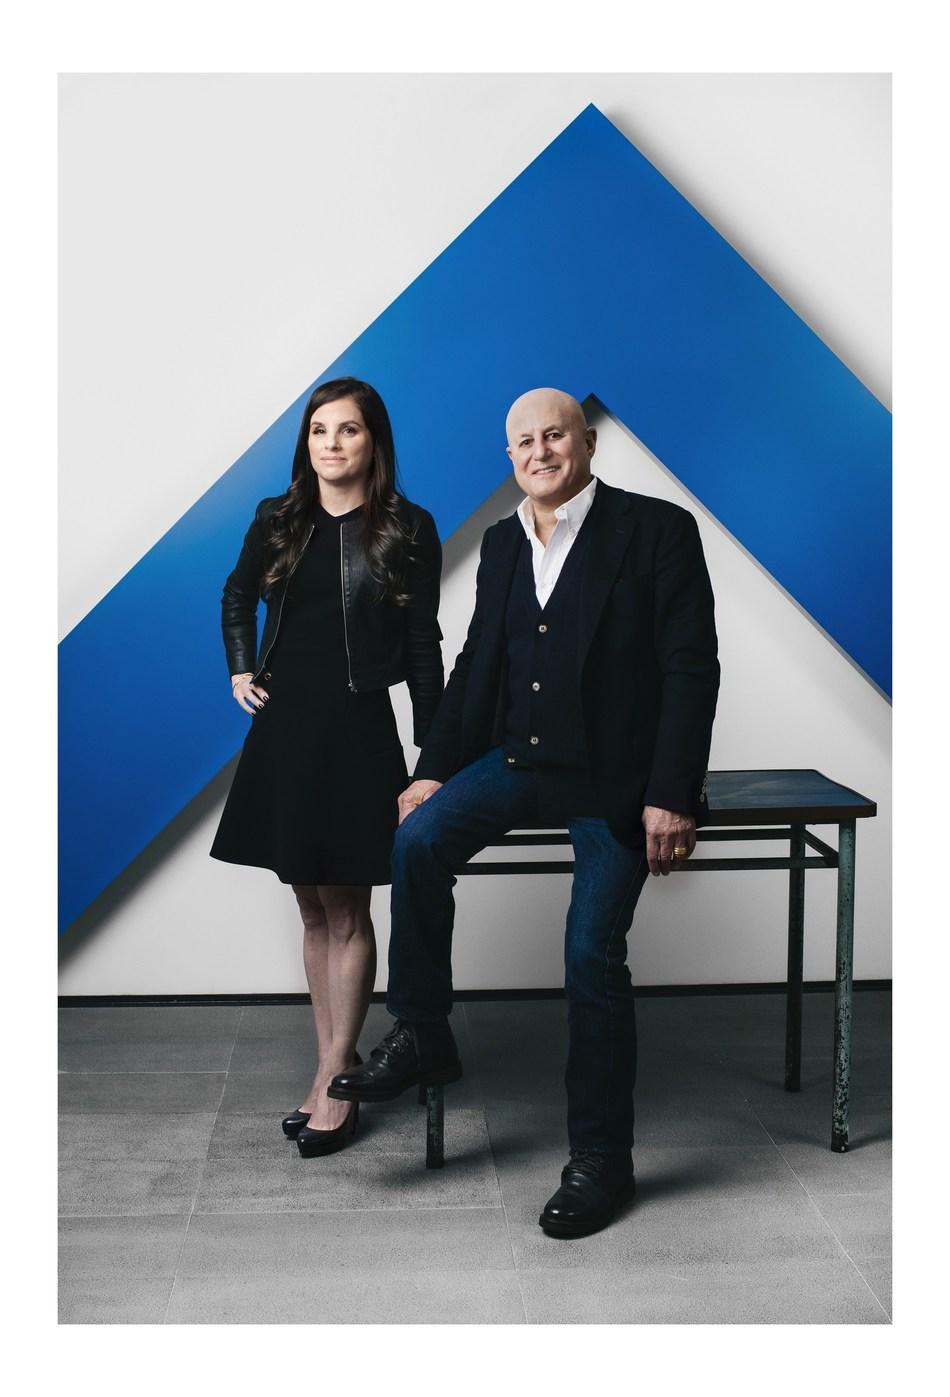 Ronald O. Perelman and Debra G. Perelman